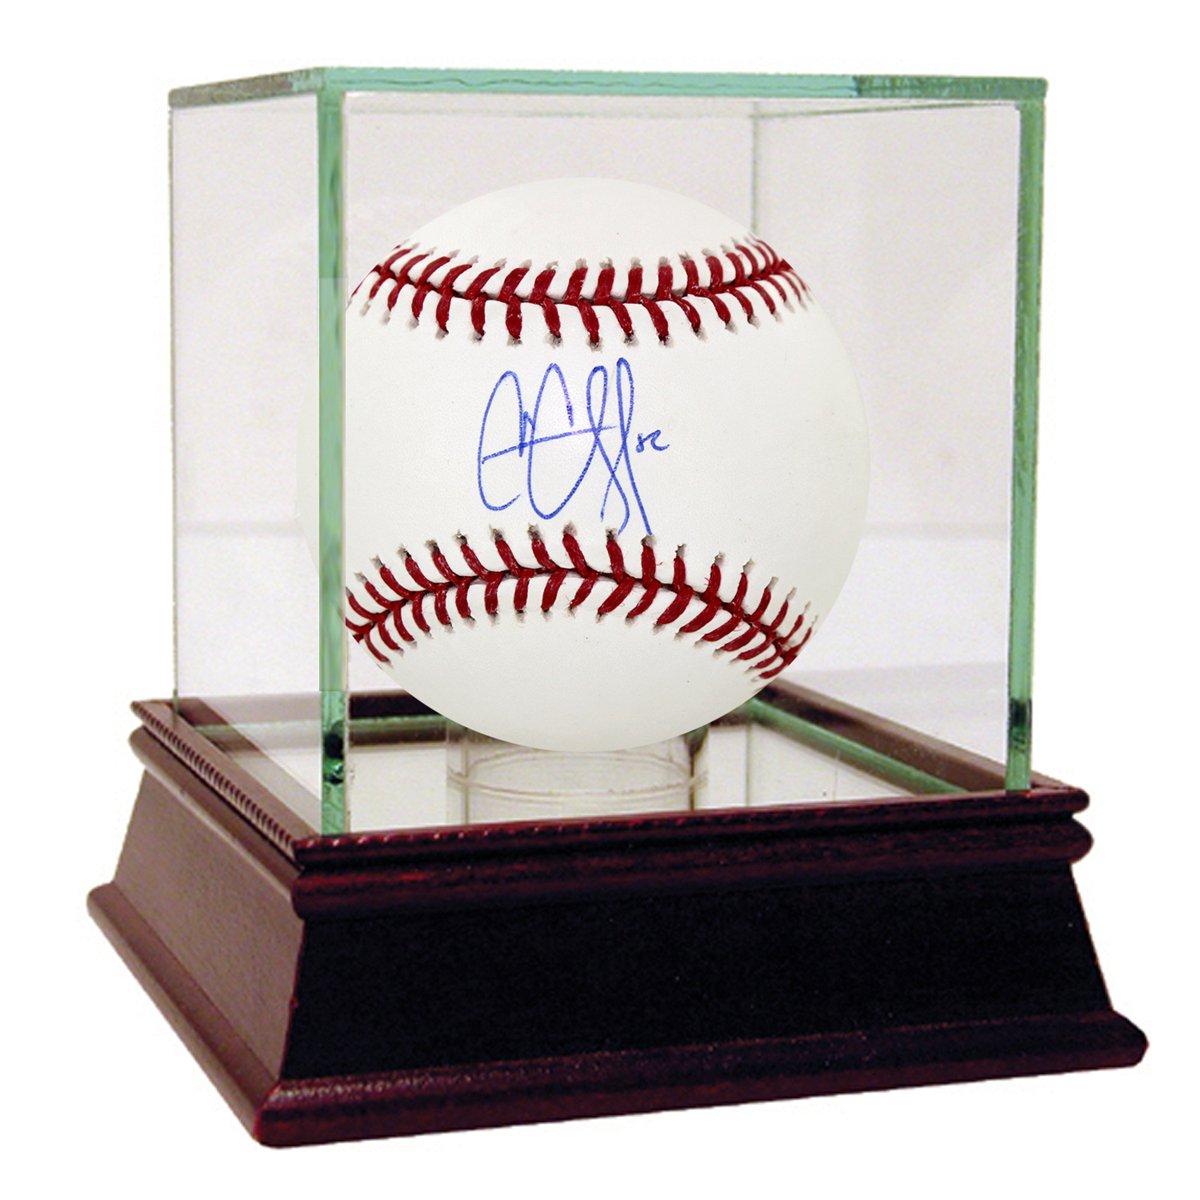 Steiner Sports MLB New York Yankees CC Sabathia Signed Baseball SABABAS000015